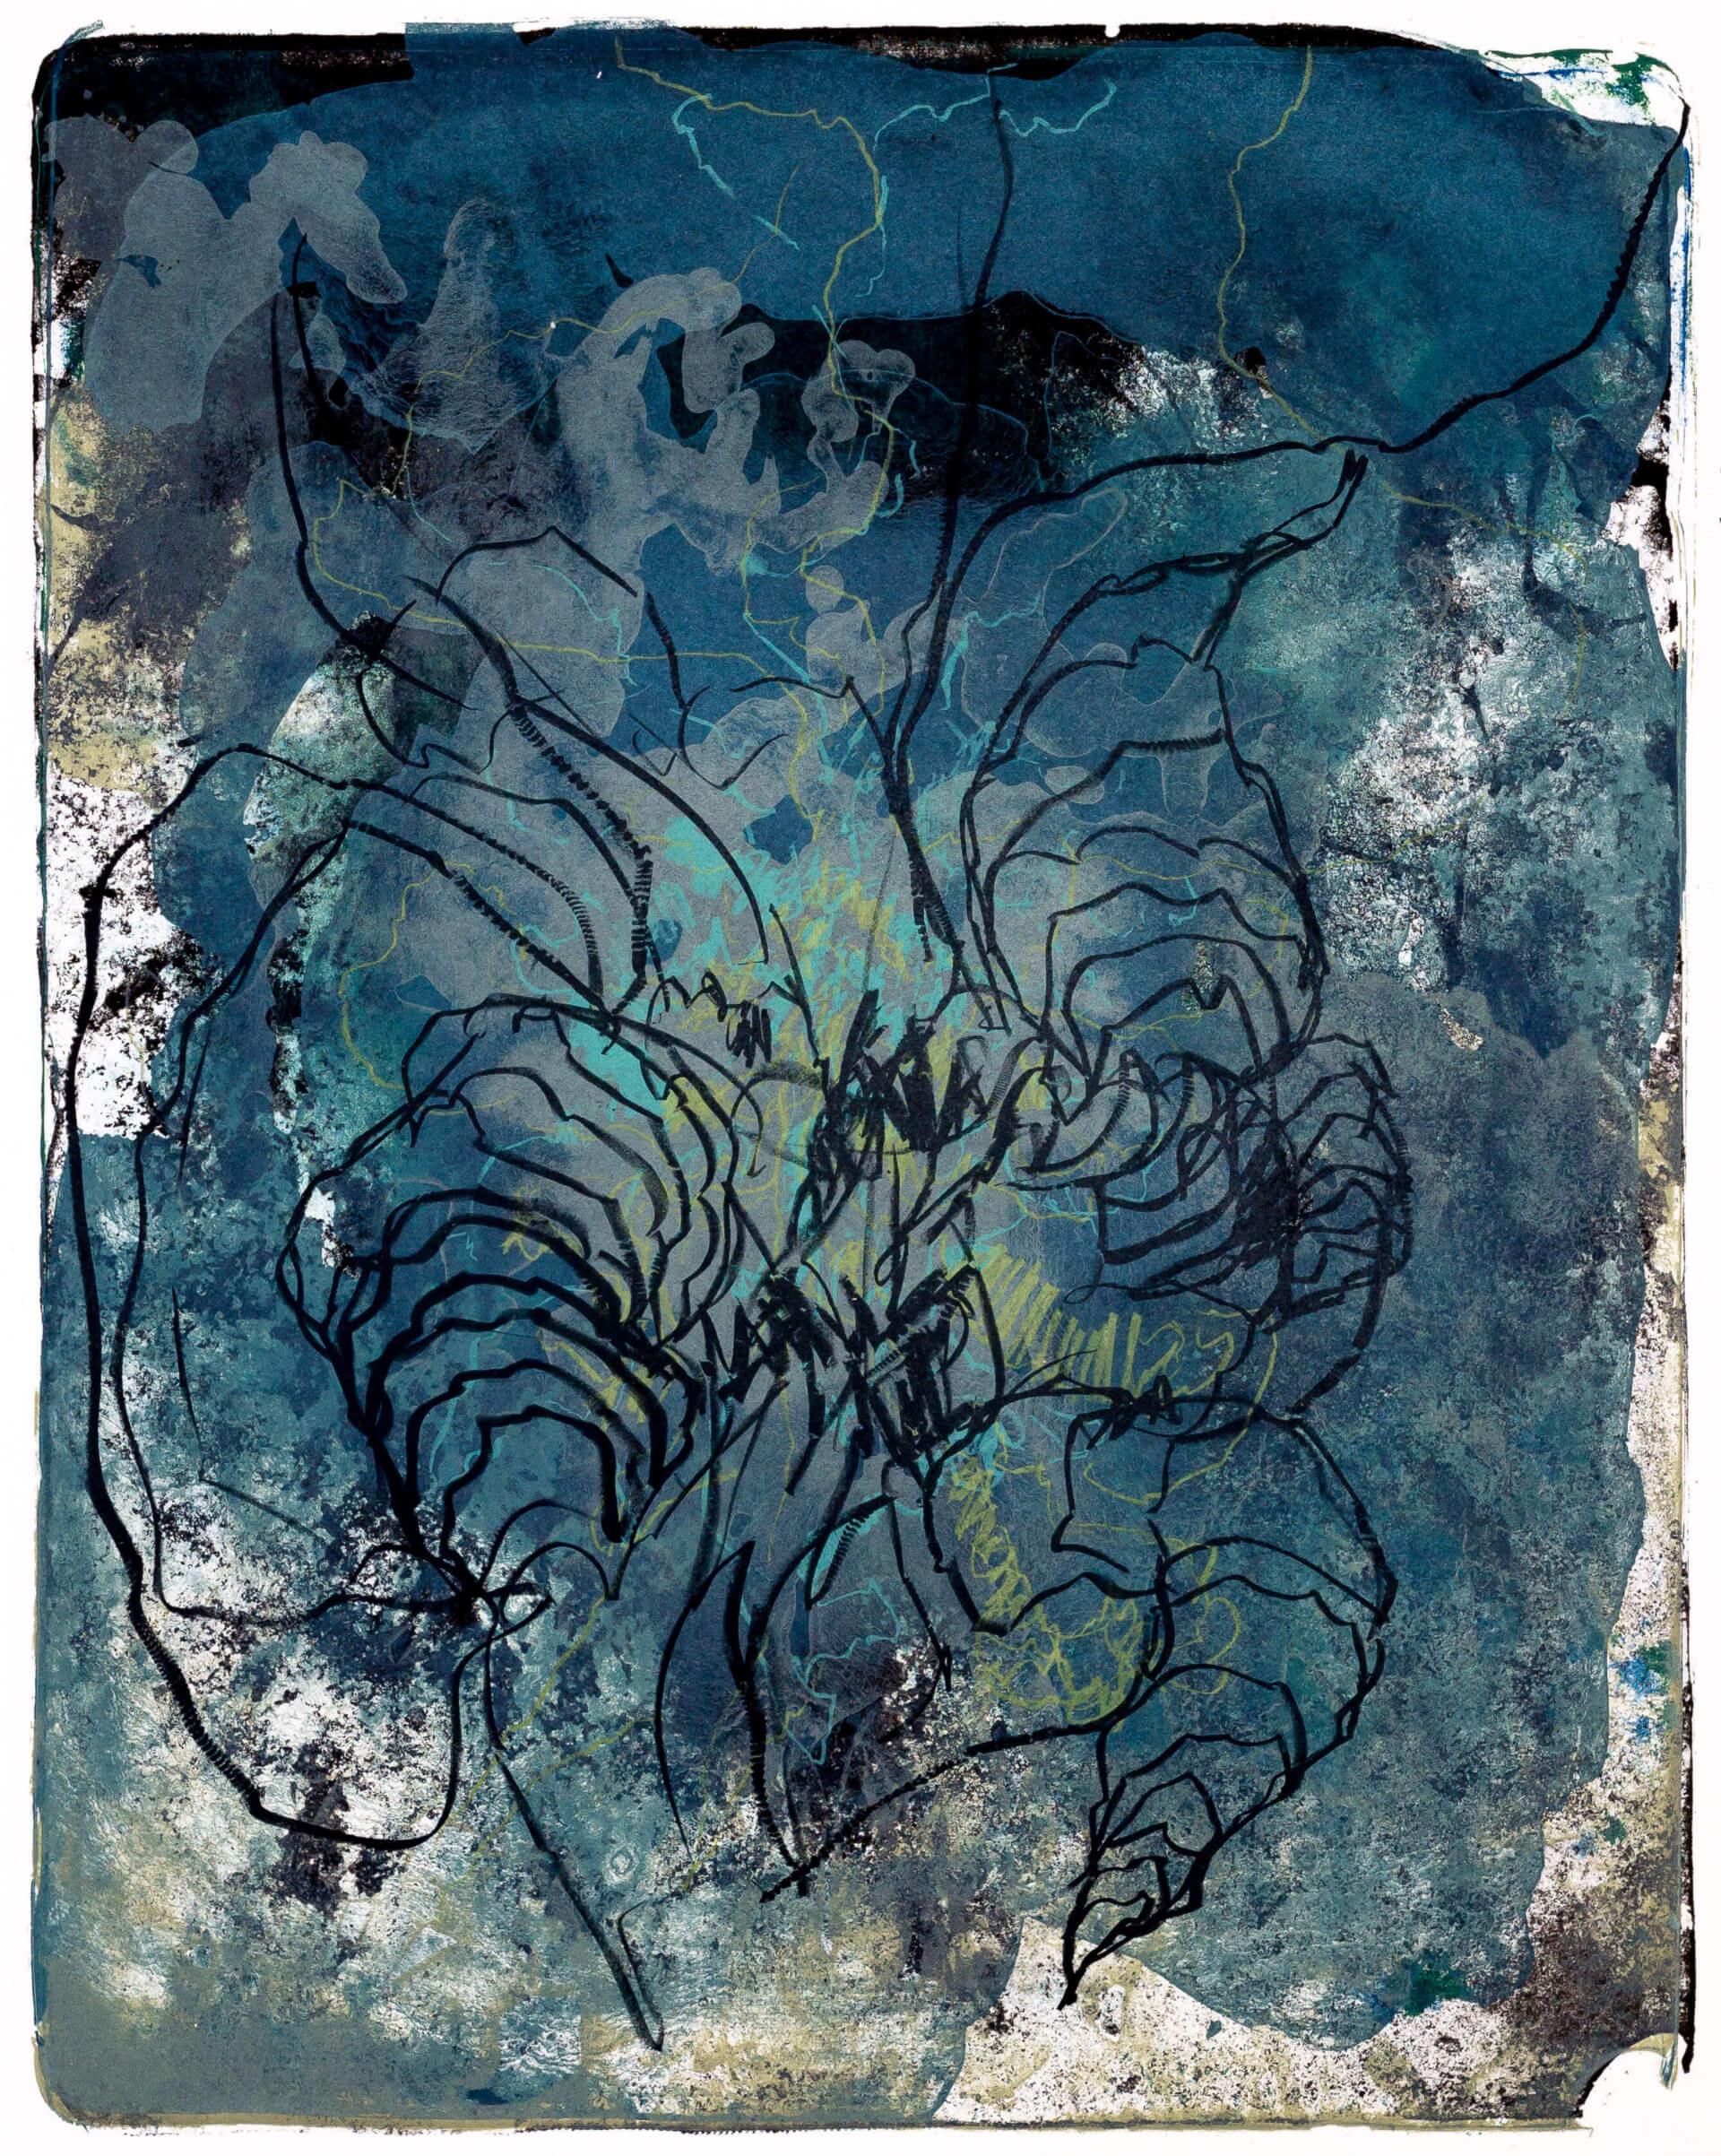 Katharina Albers, organism (Wald) VII, 2016, Farblithographie, Unikat, 50x40 cm